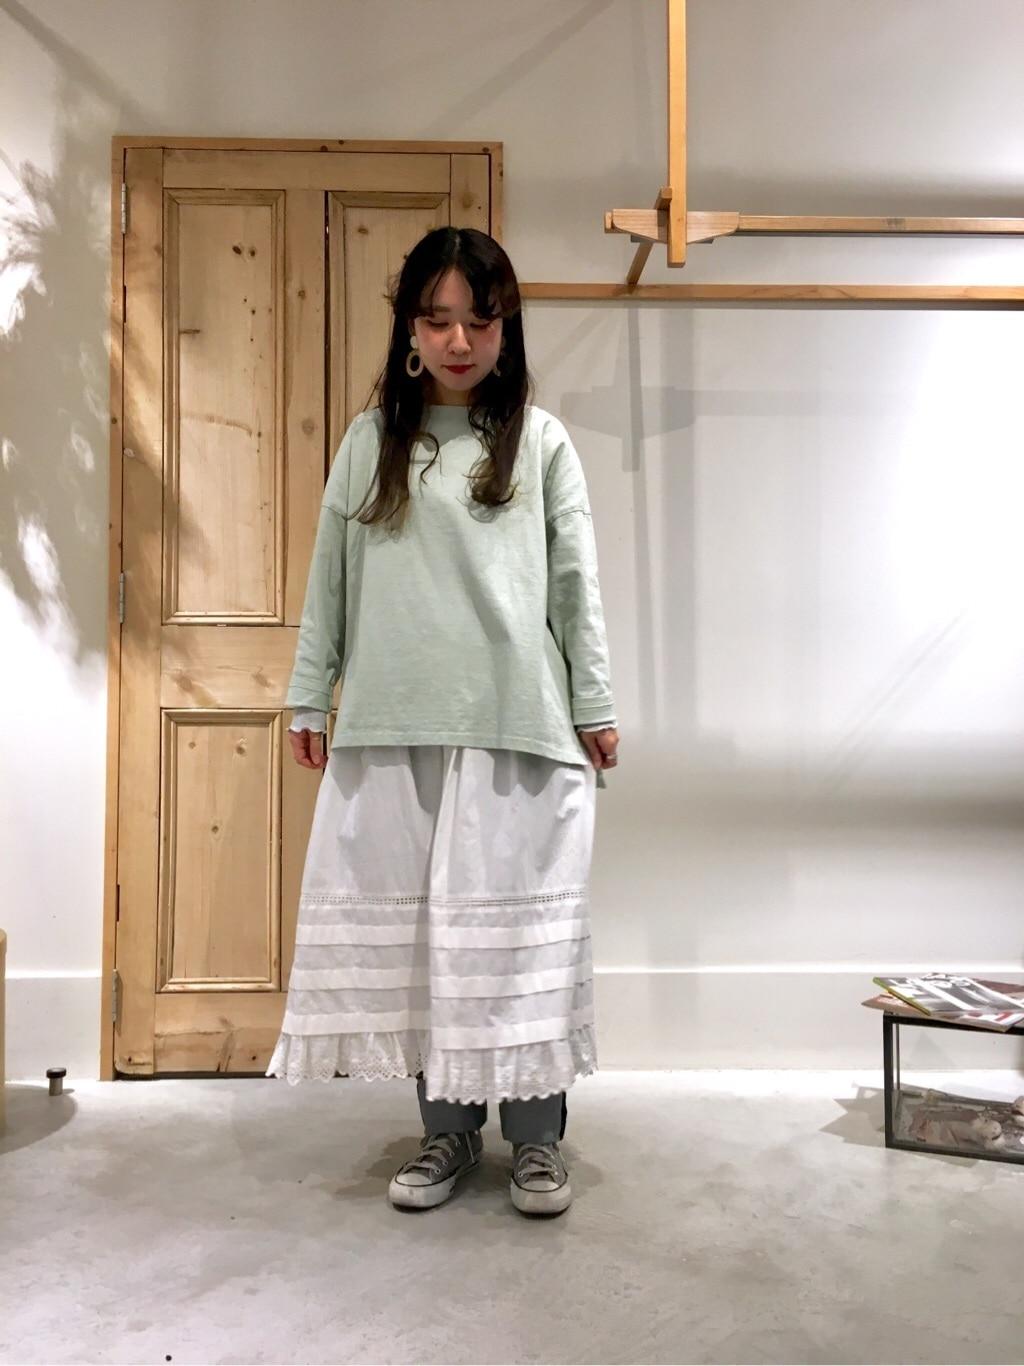 Malle chambre de charme 調布パルコ 身長:152cm 2020.01.24